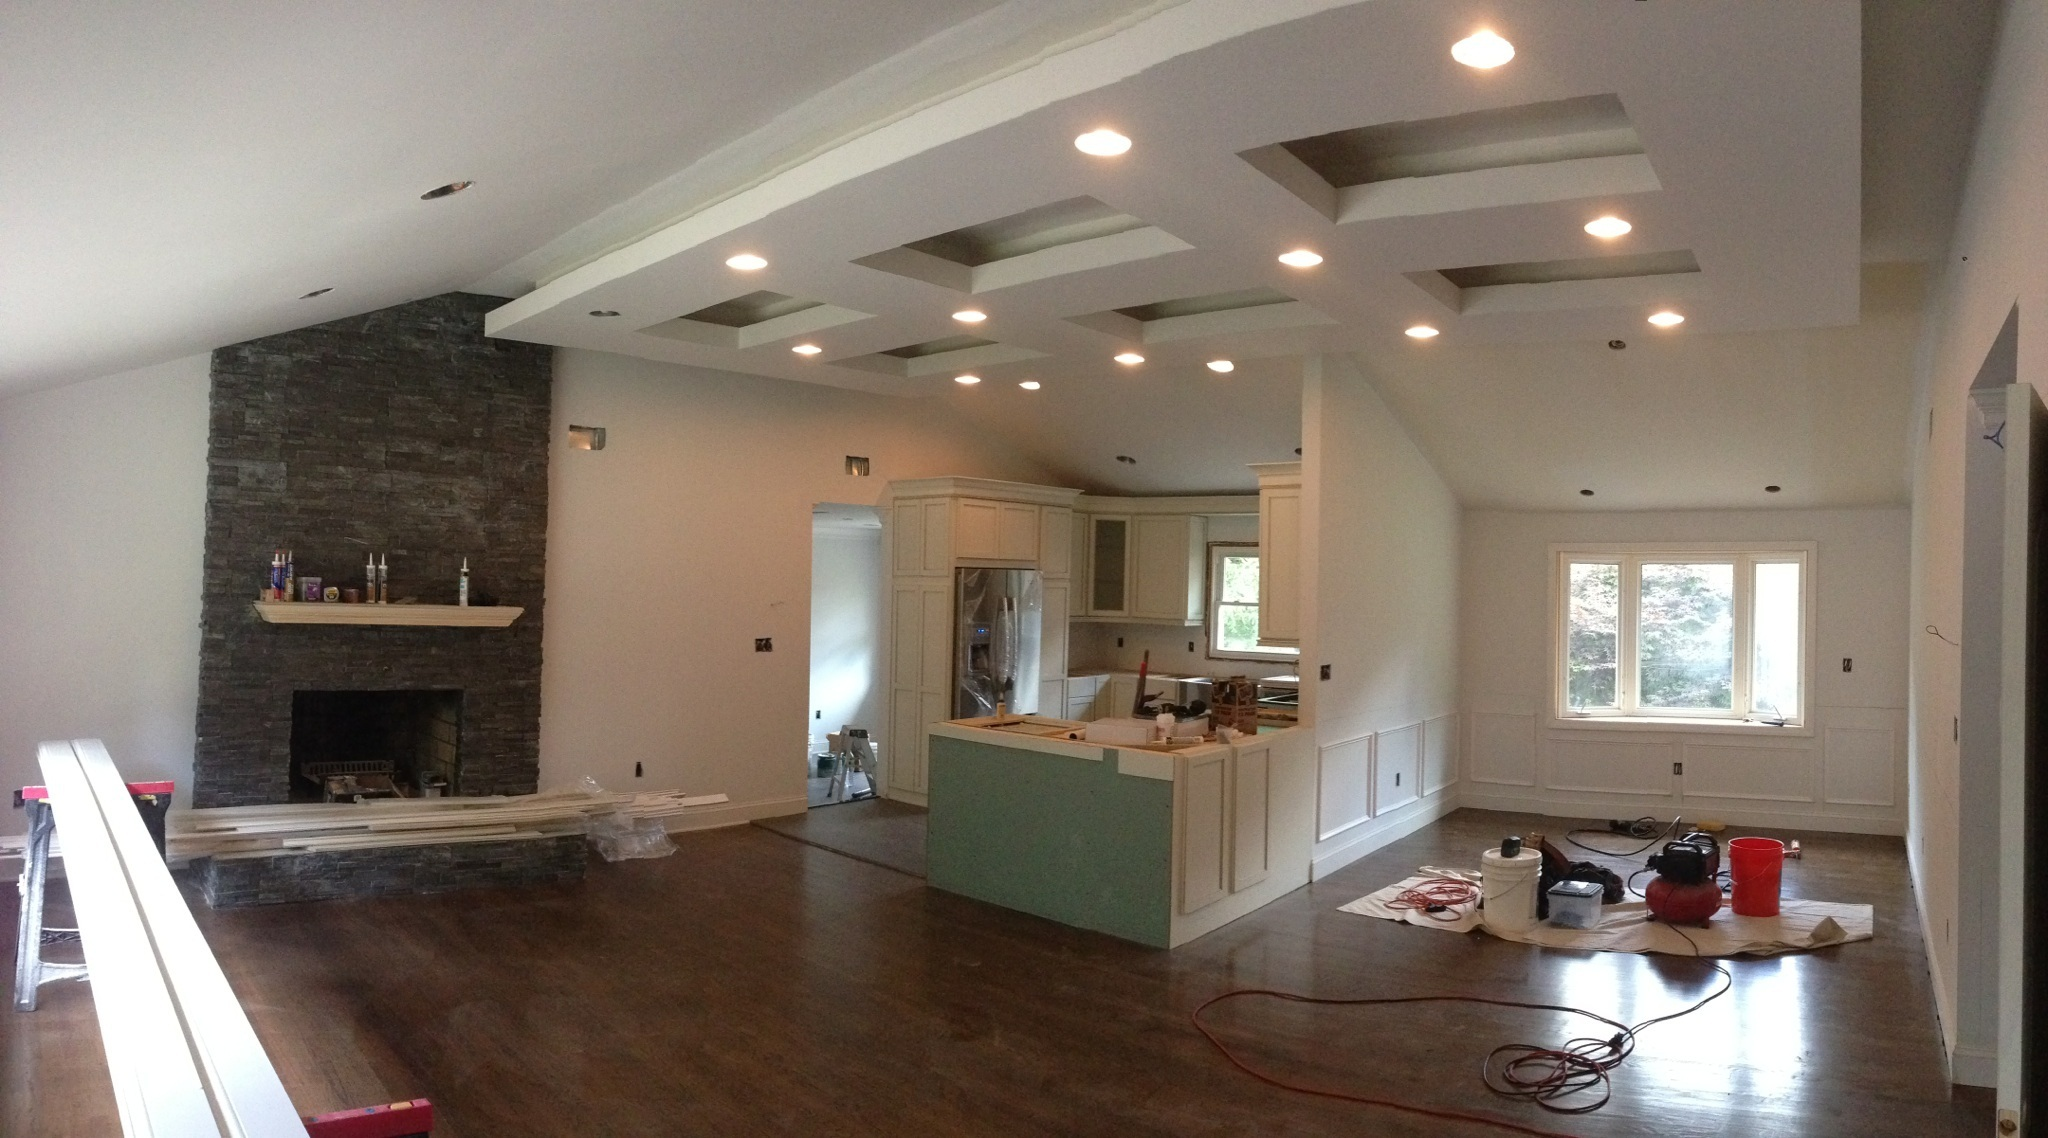 Bakersfield Interior & Exterior Home Painters  Superior